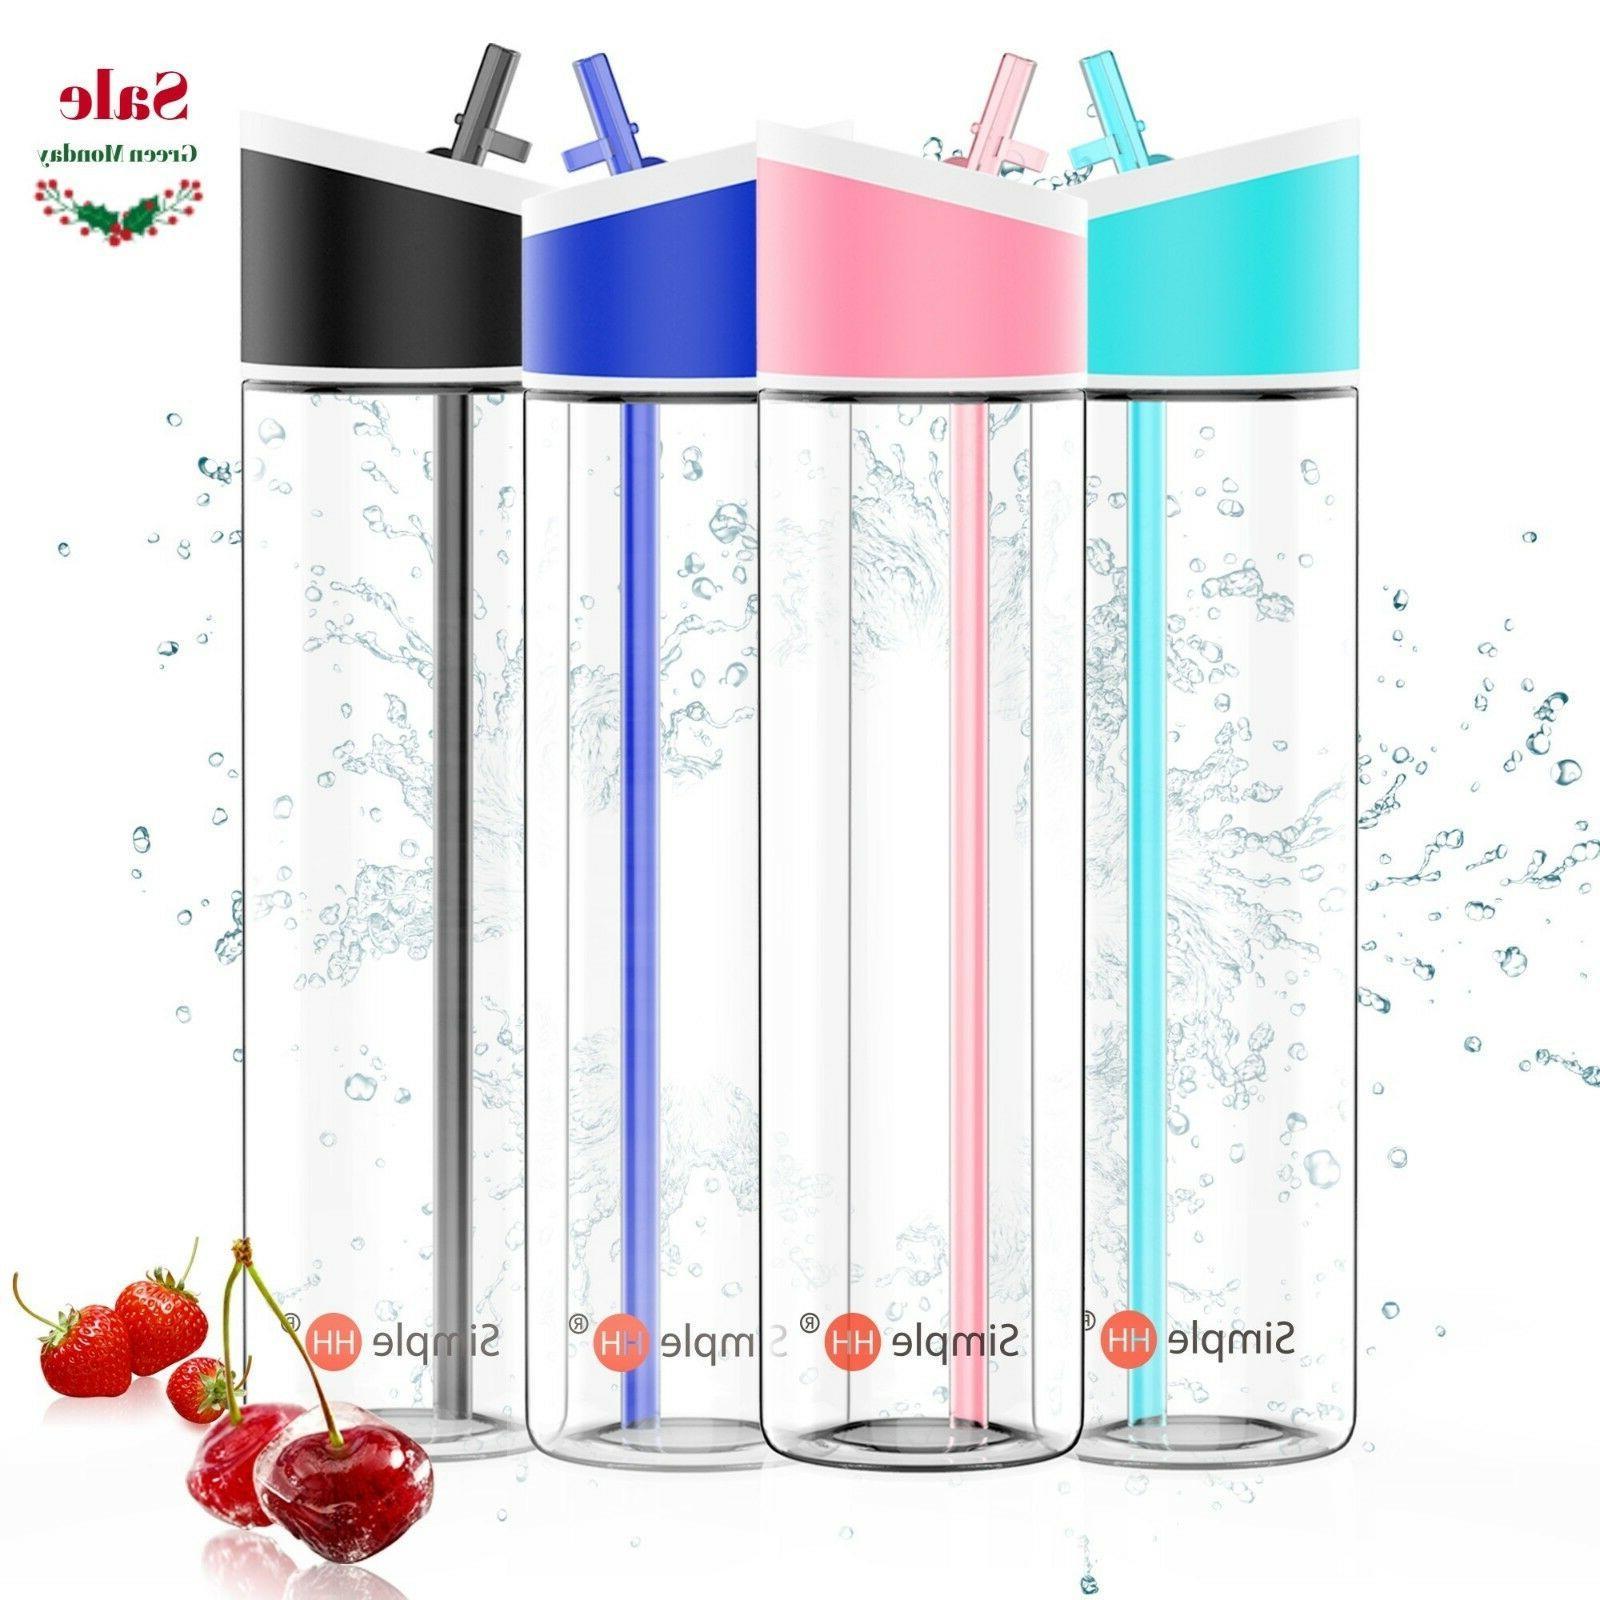 4-Pack Green Monday 21oz|621ml BPA Free Sports Water Bottle